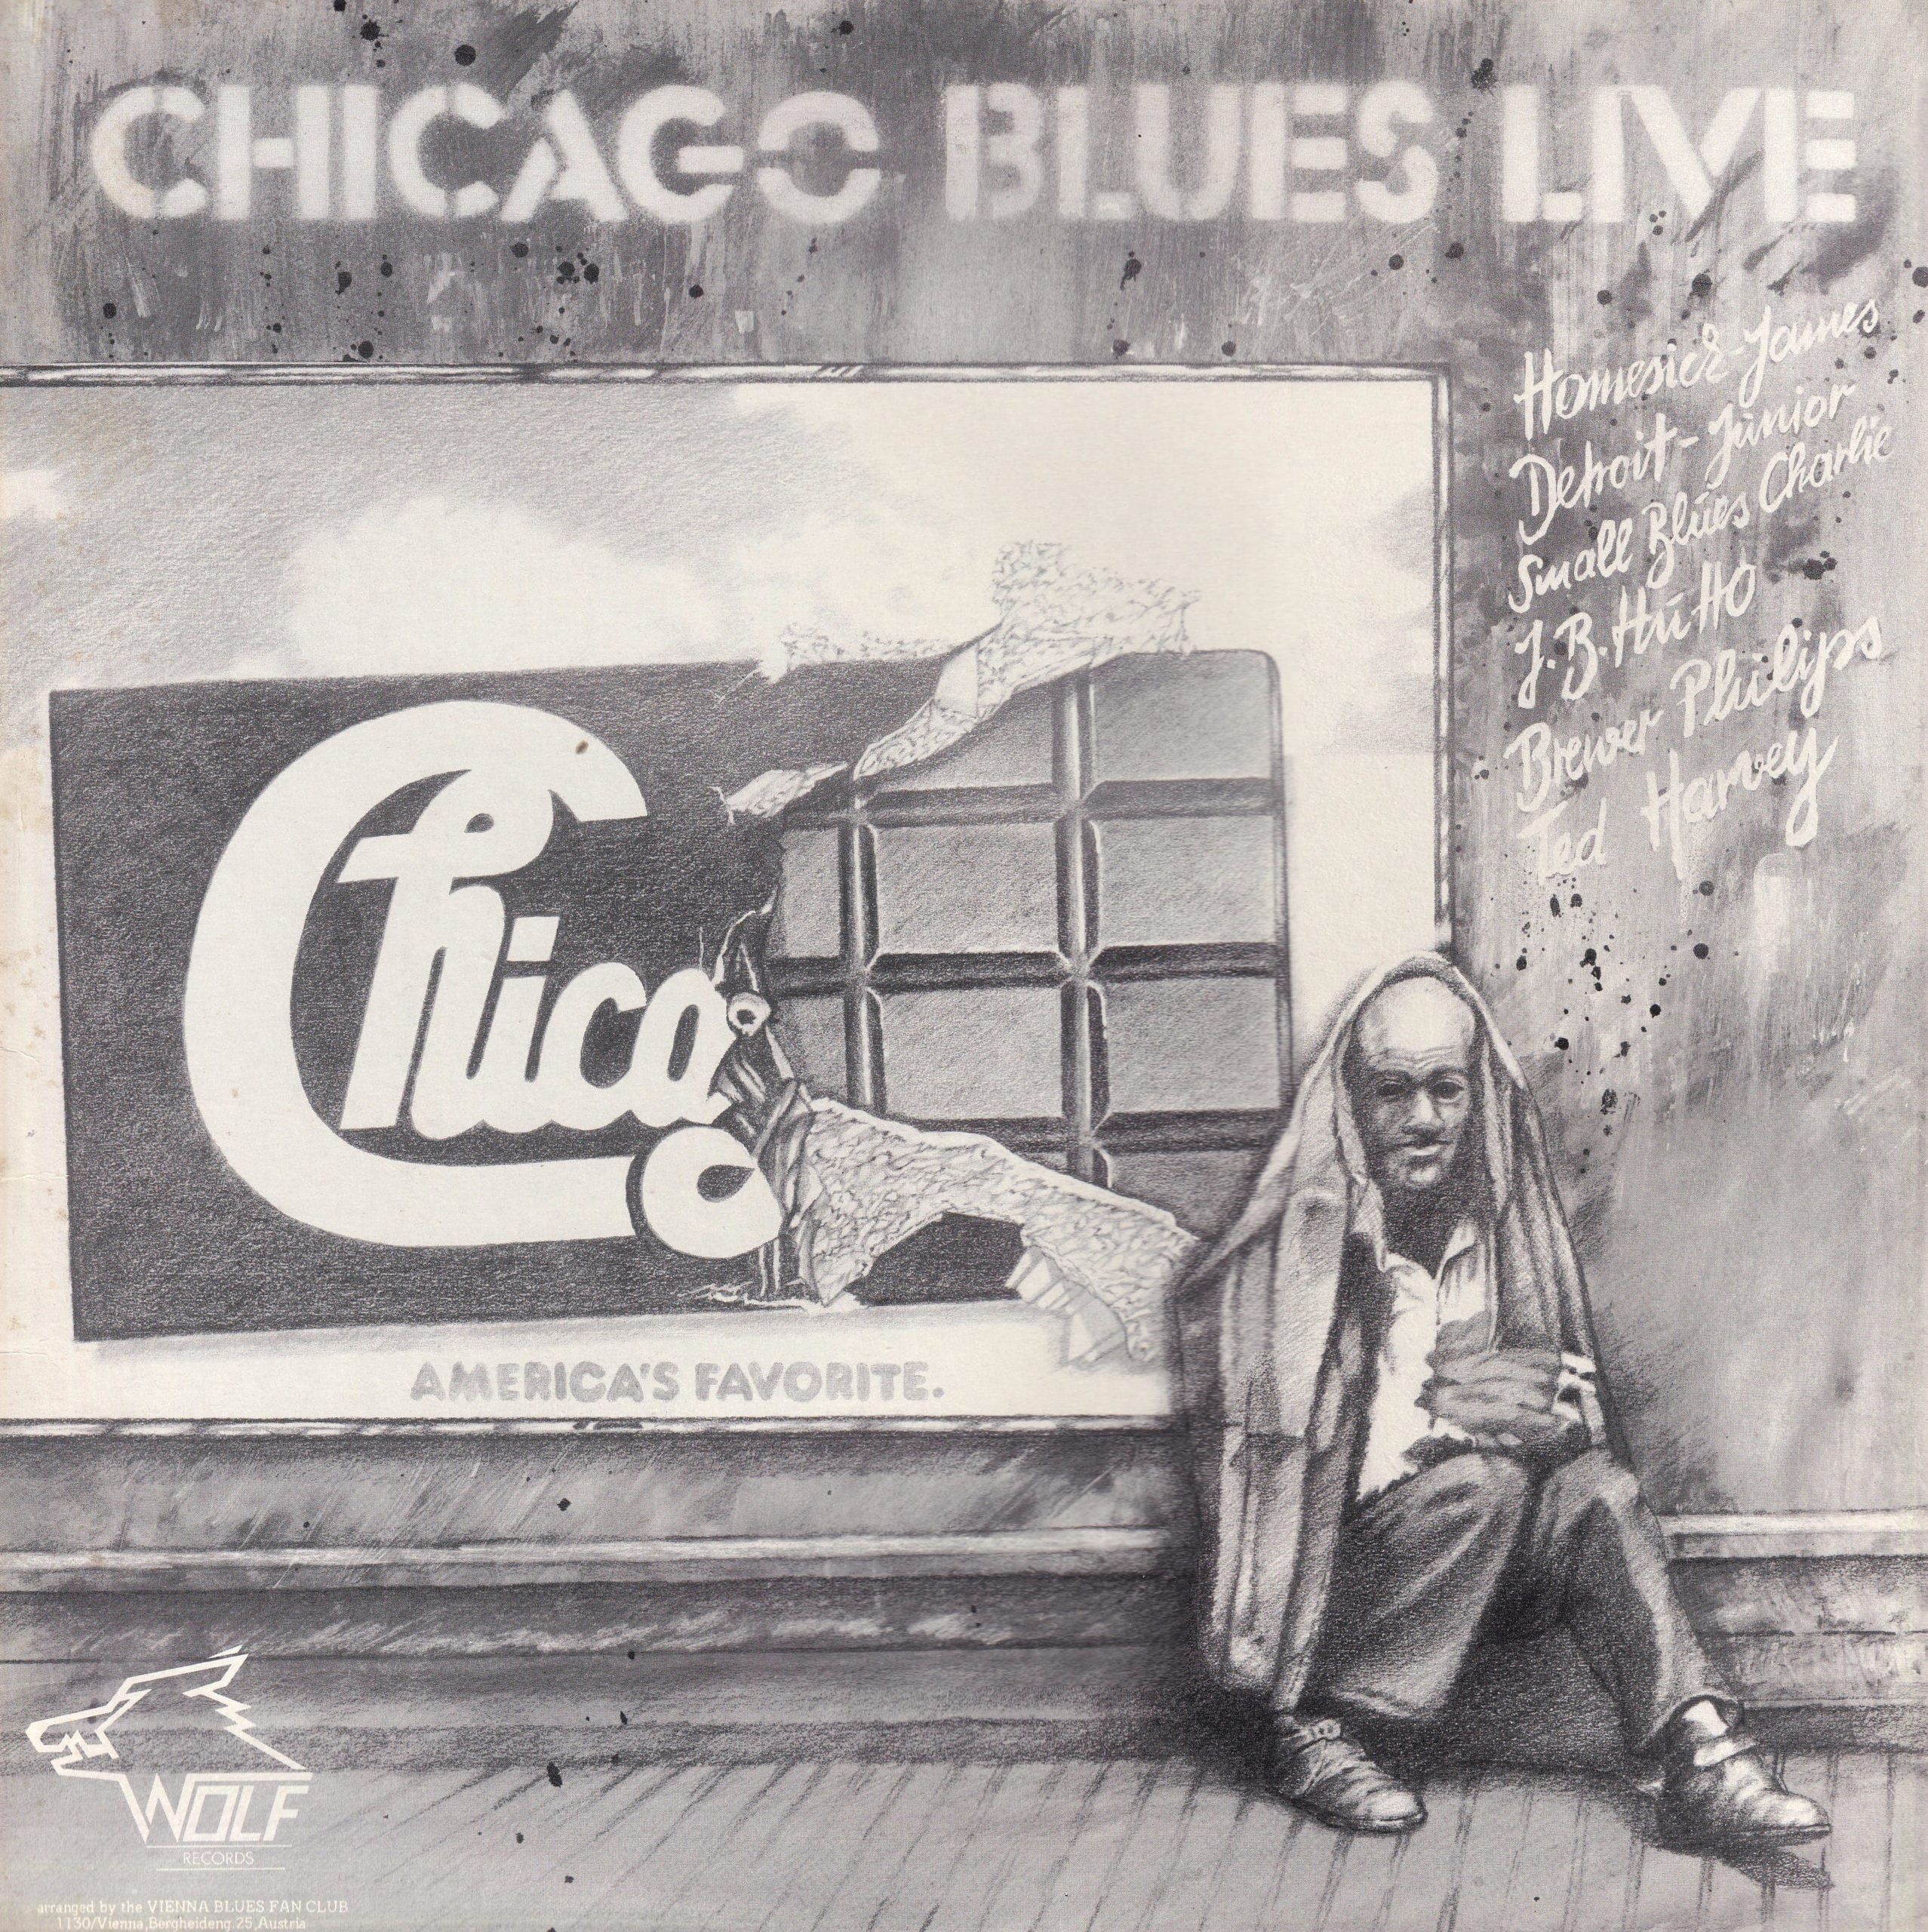 Chicago Blues Live – 1